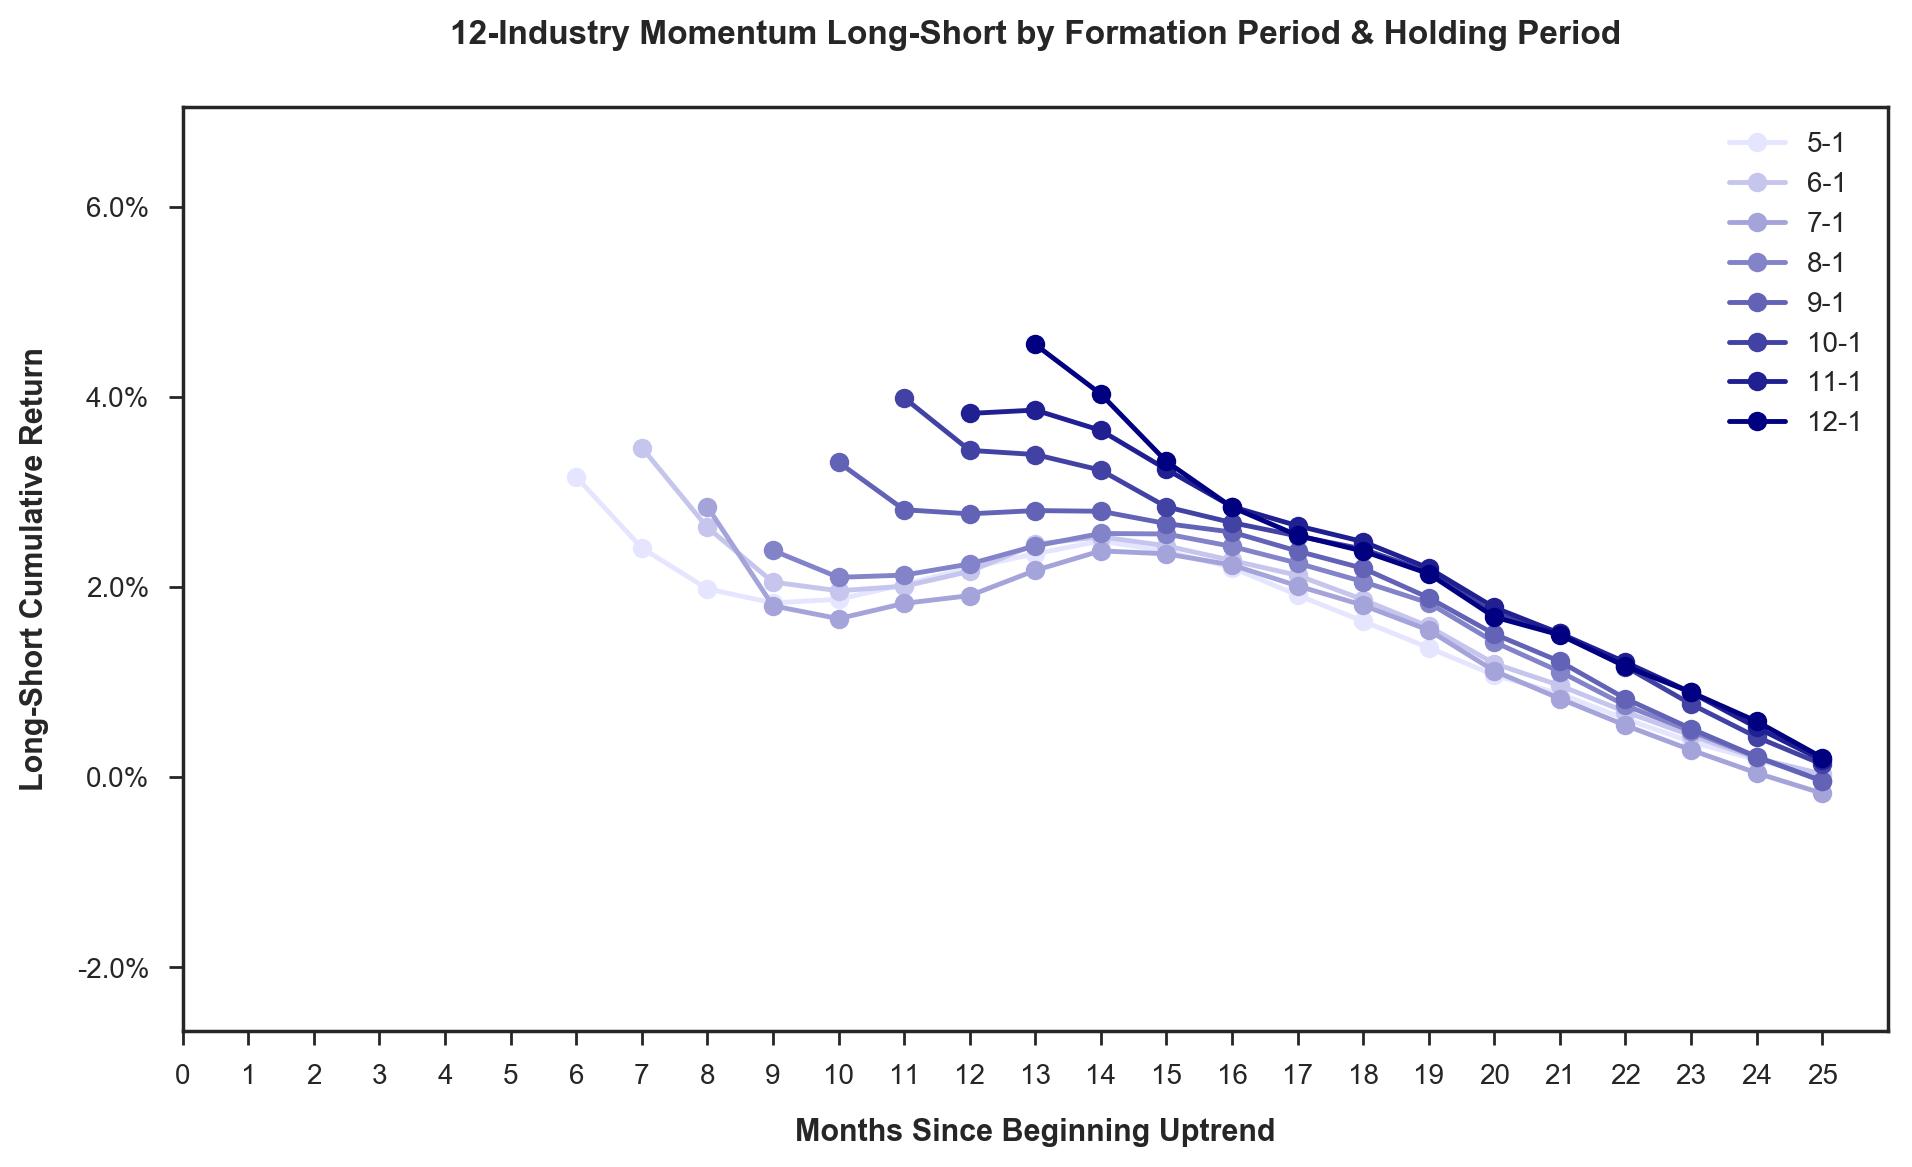 B 12-industry-momentum-ls